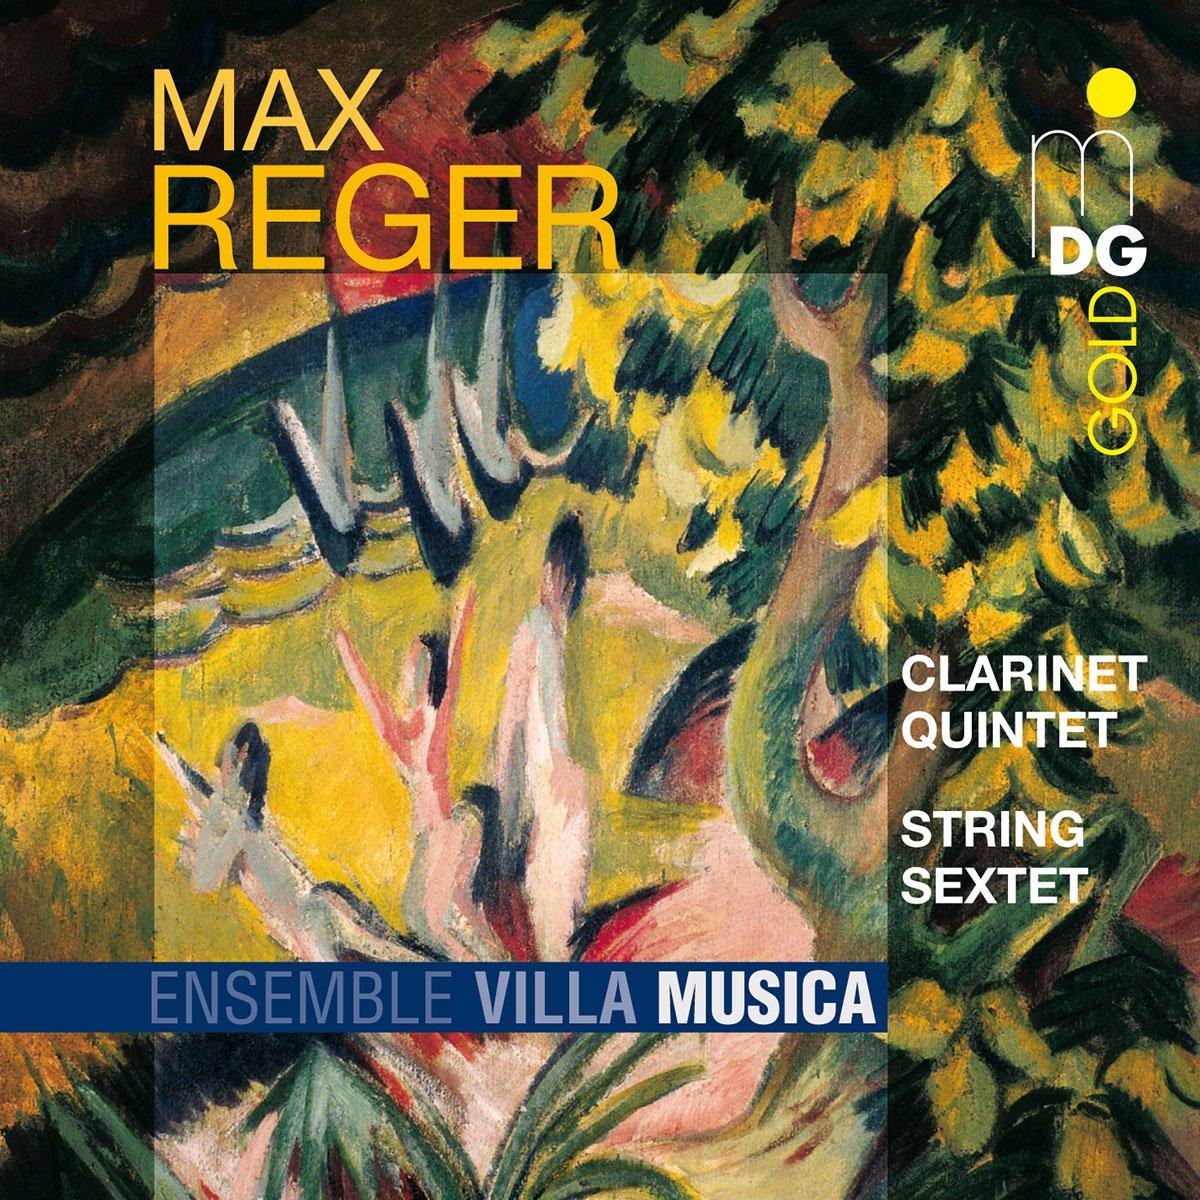 reger - Max Reger - Page 3 81JmryVXUmL._SL1200_